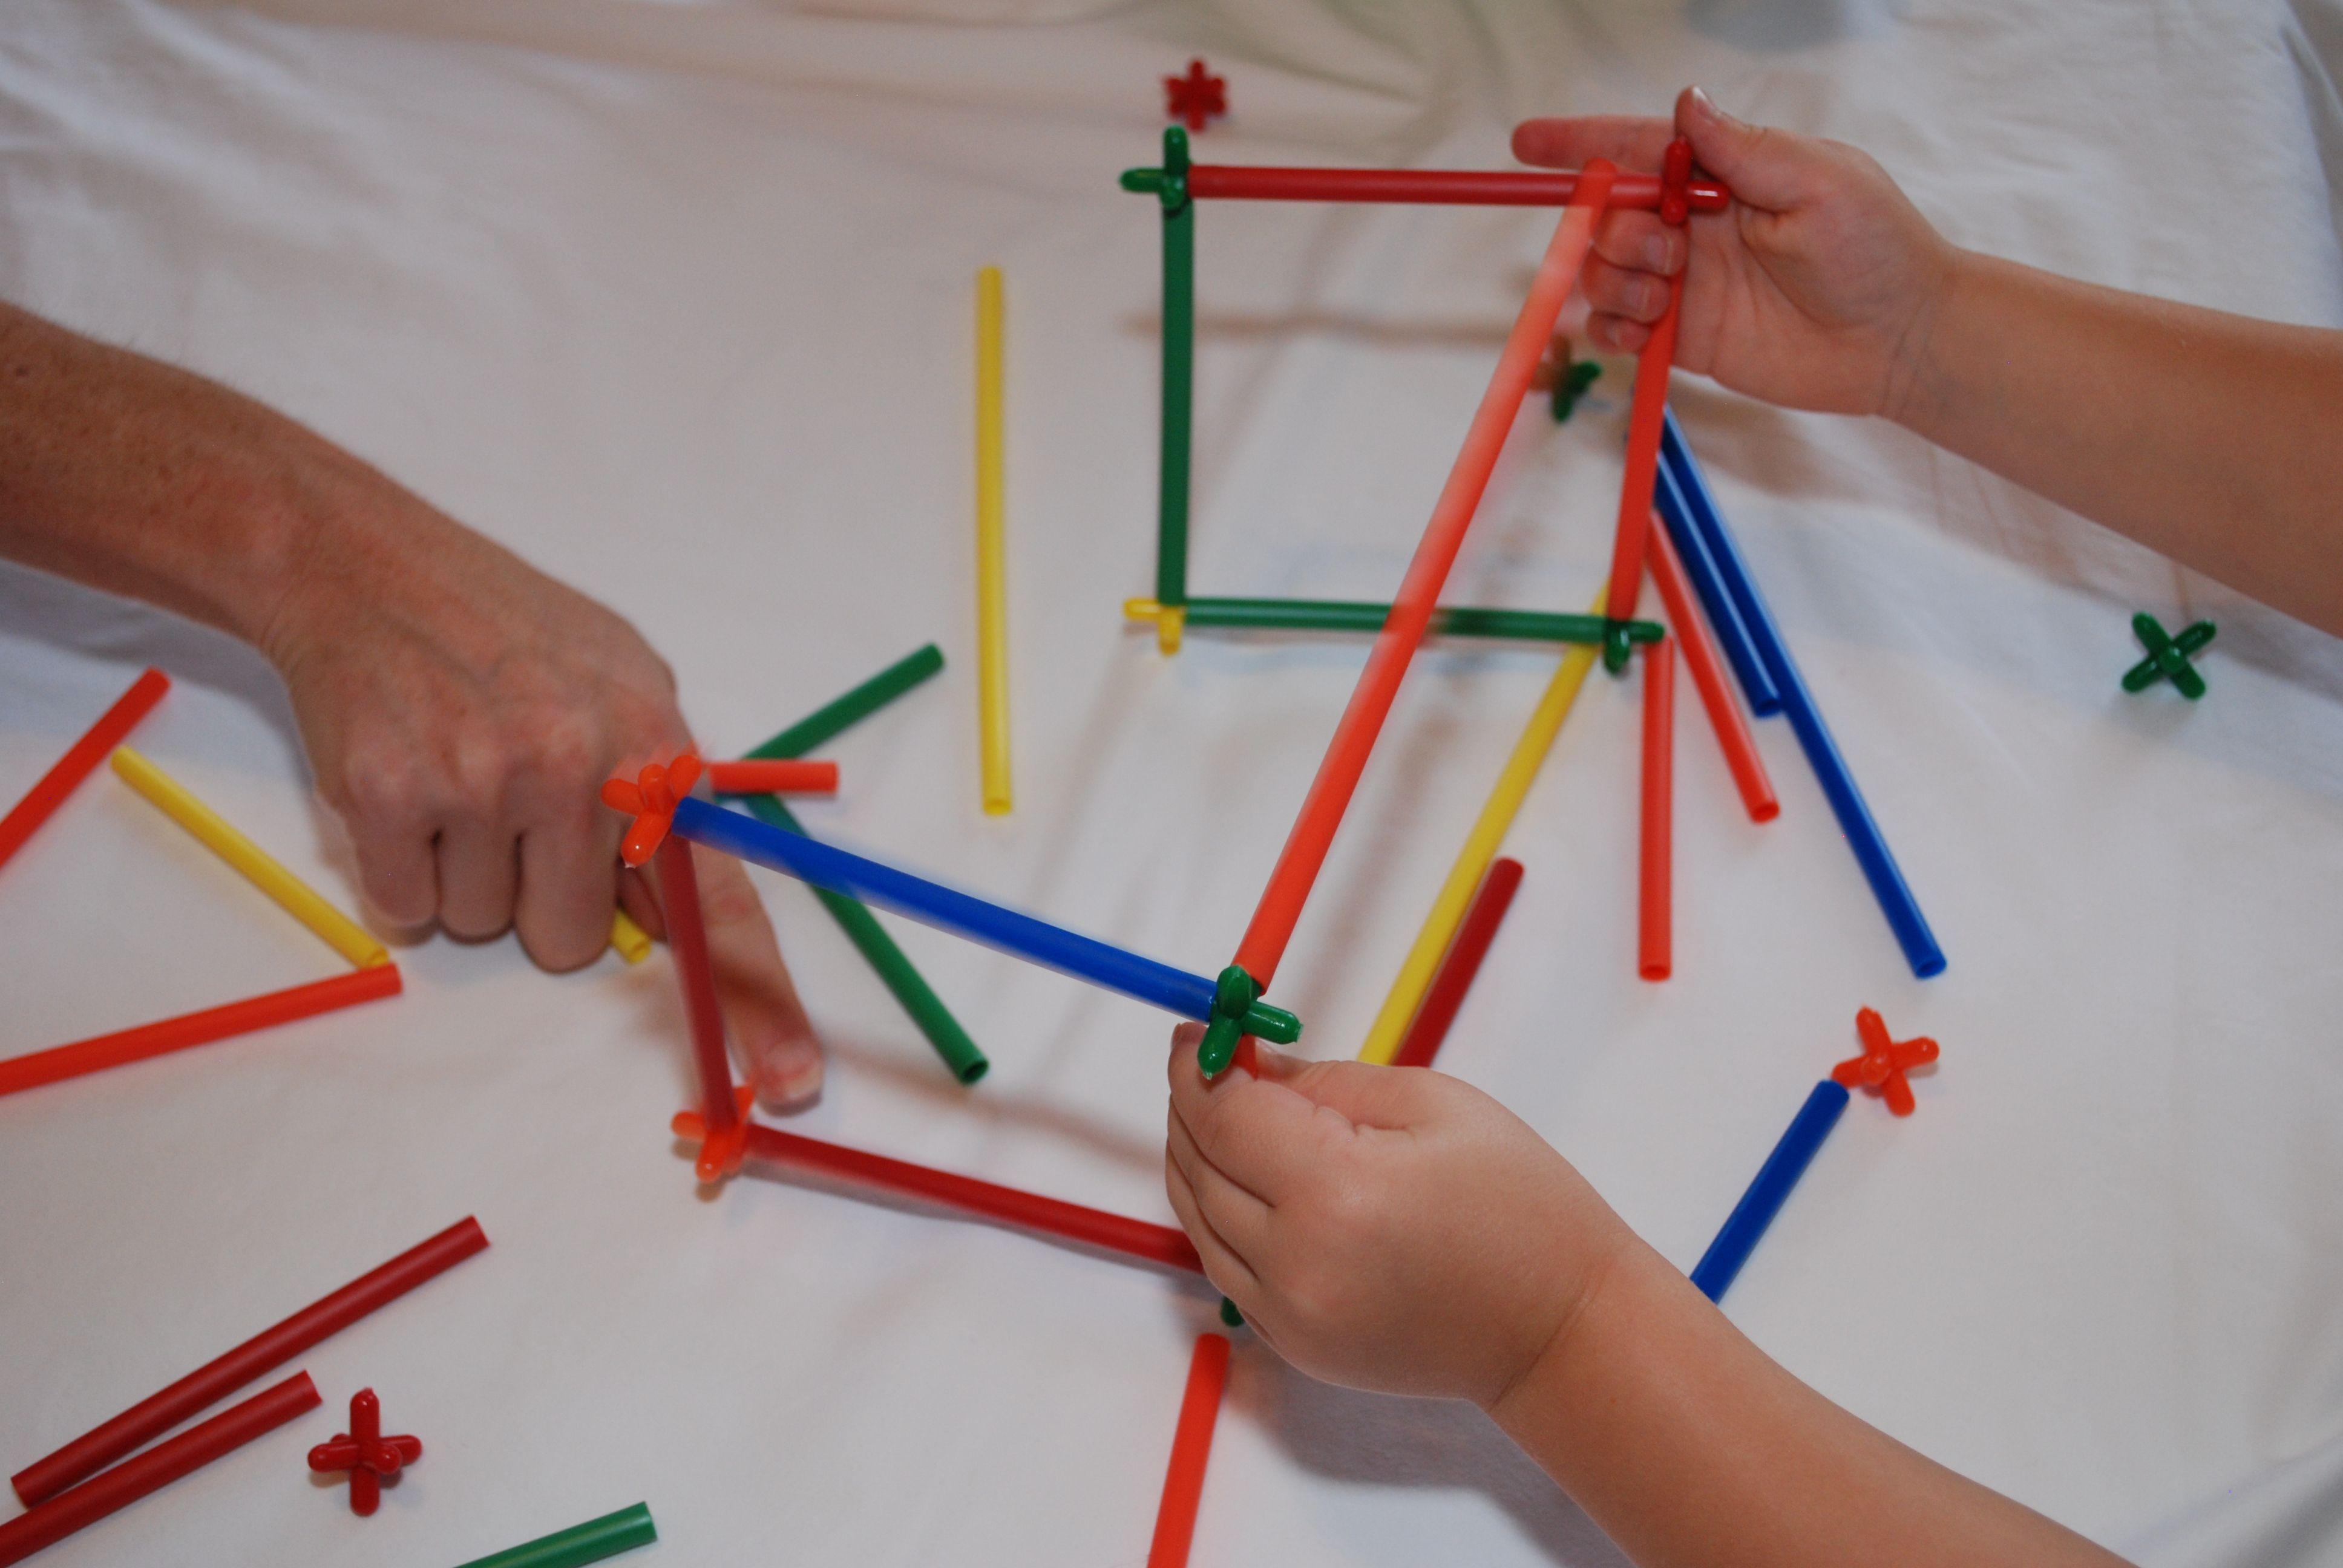 Preschool Construction Activities Develop Logical